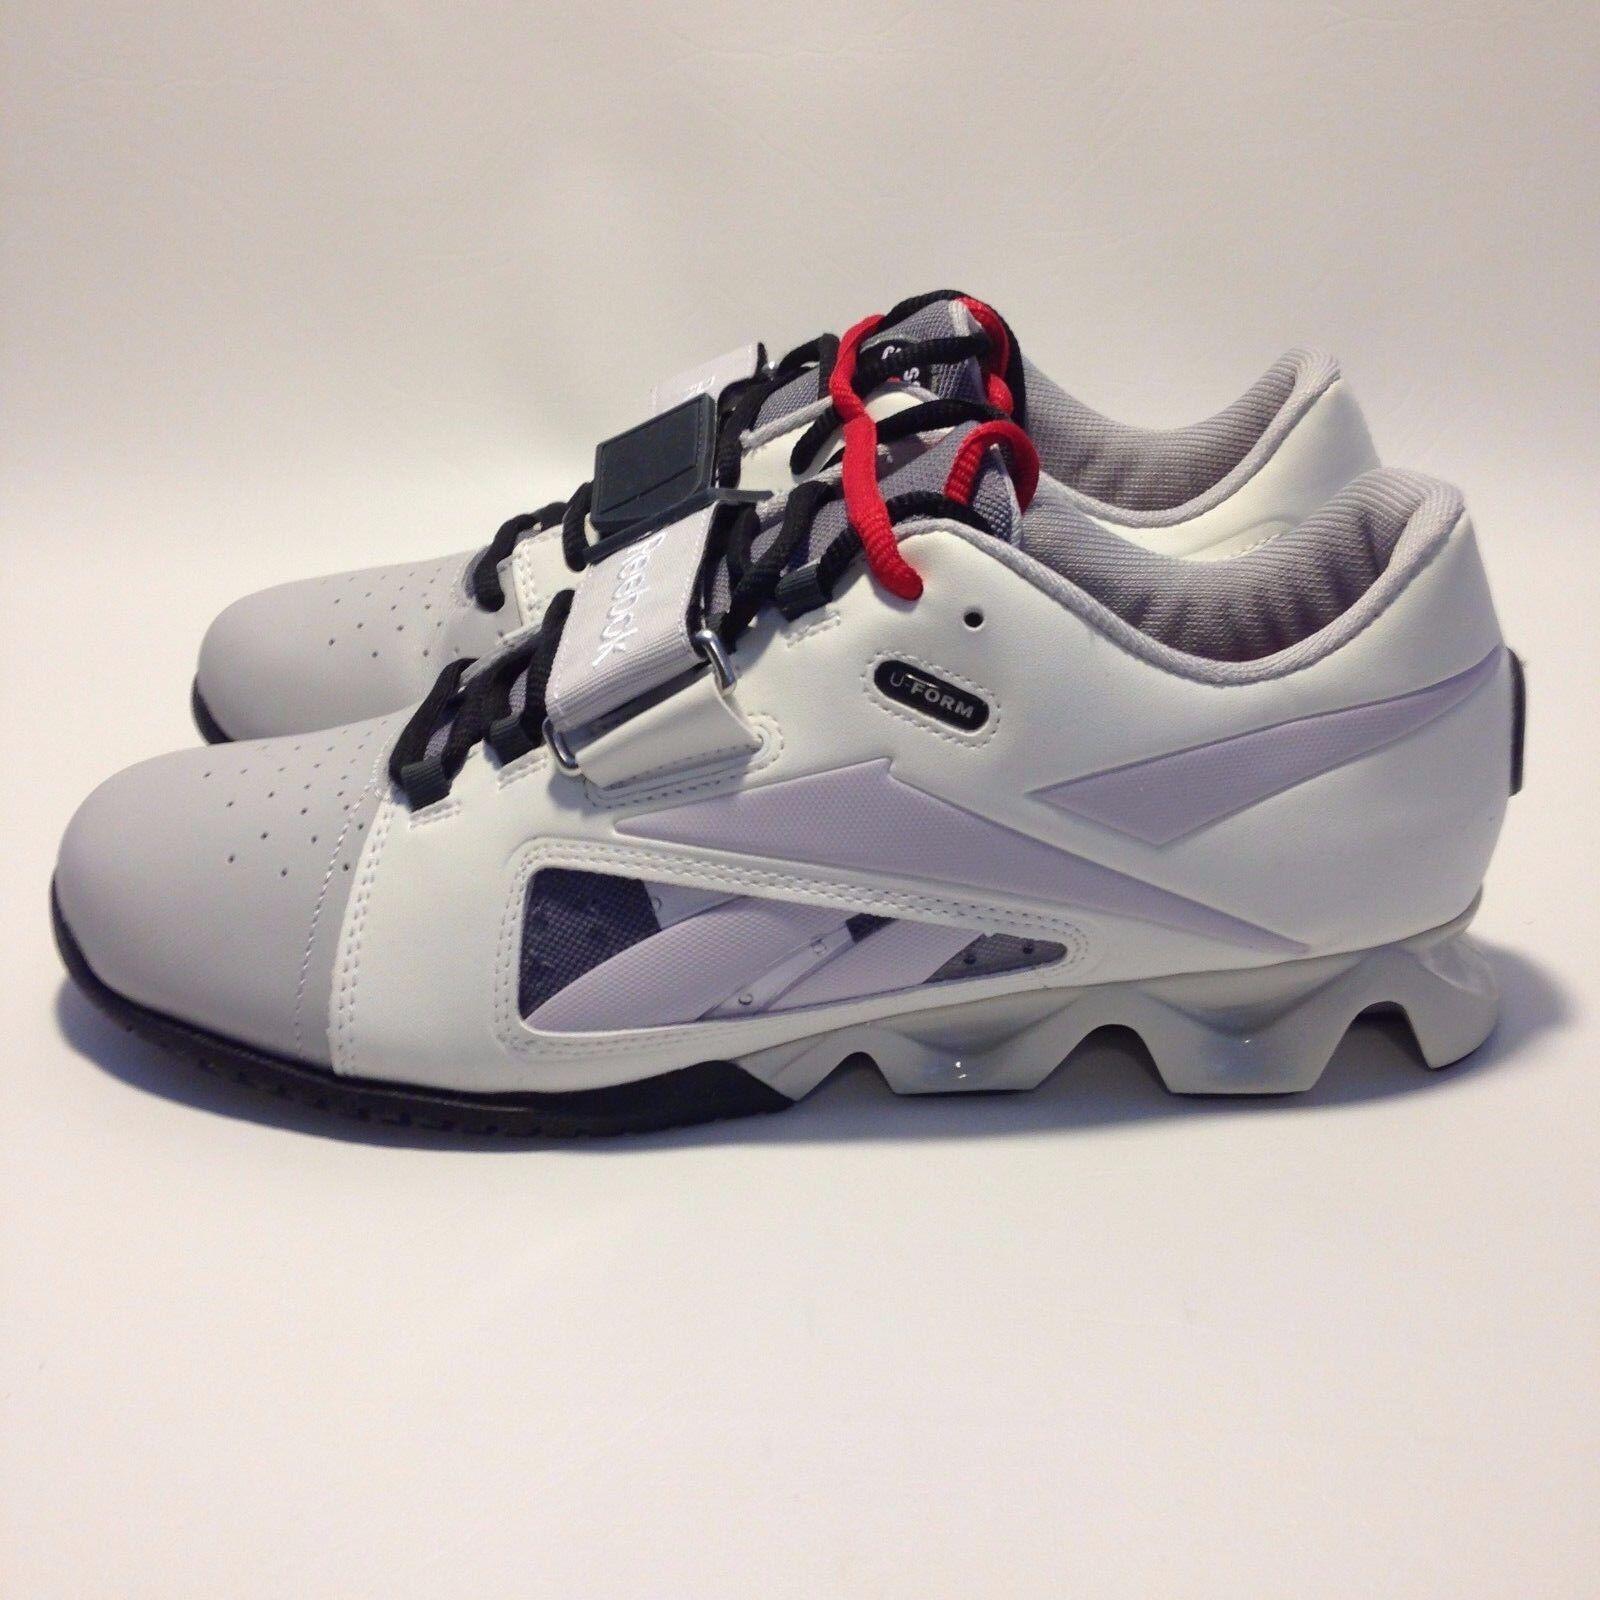 Reebok [J99809] Crossfit Oly U-shape Lifter scarpe For donna Dimensione  10.5